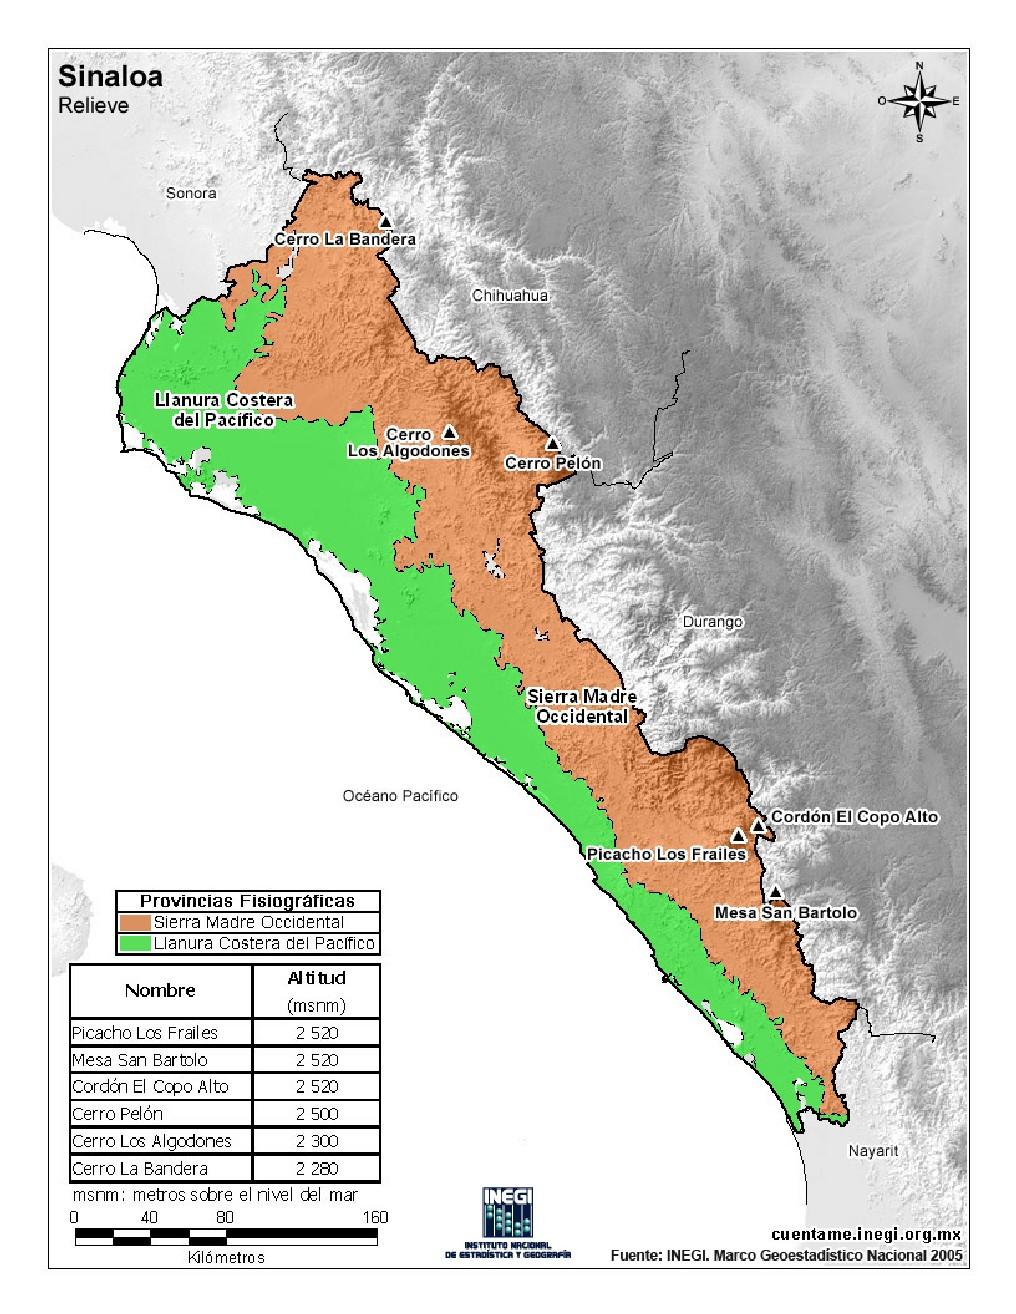 Mapa en color de montañas de Sinaloa. INEGI de México